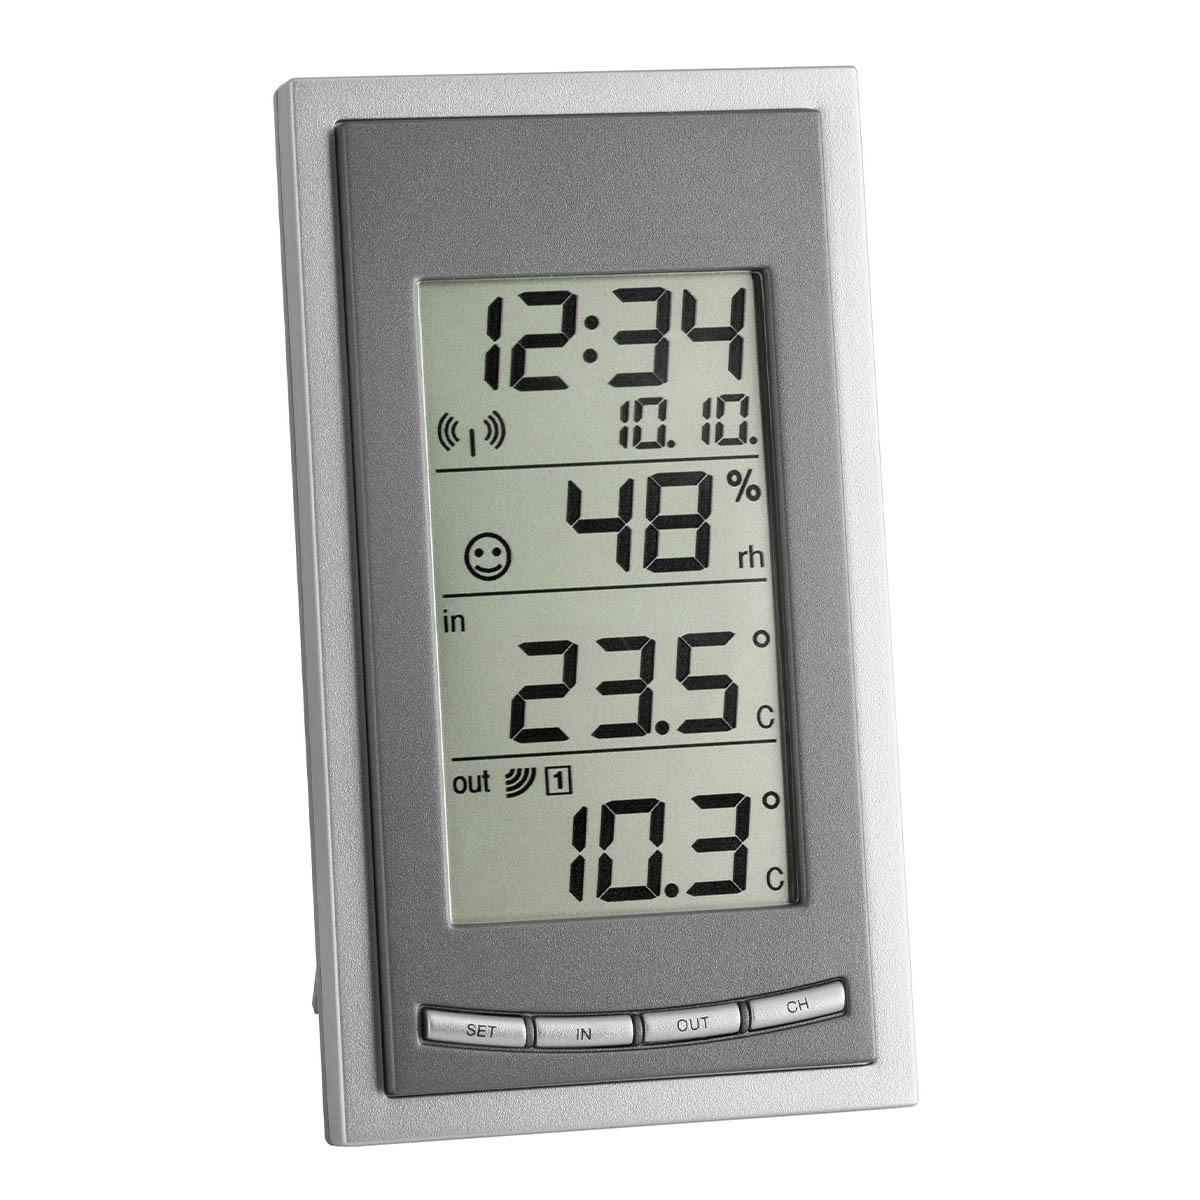 30-3018-10-it-funk-thermometer-diva-go-1200x1200px.jpg